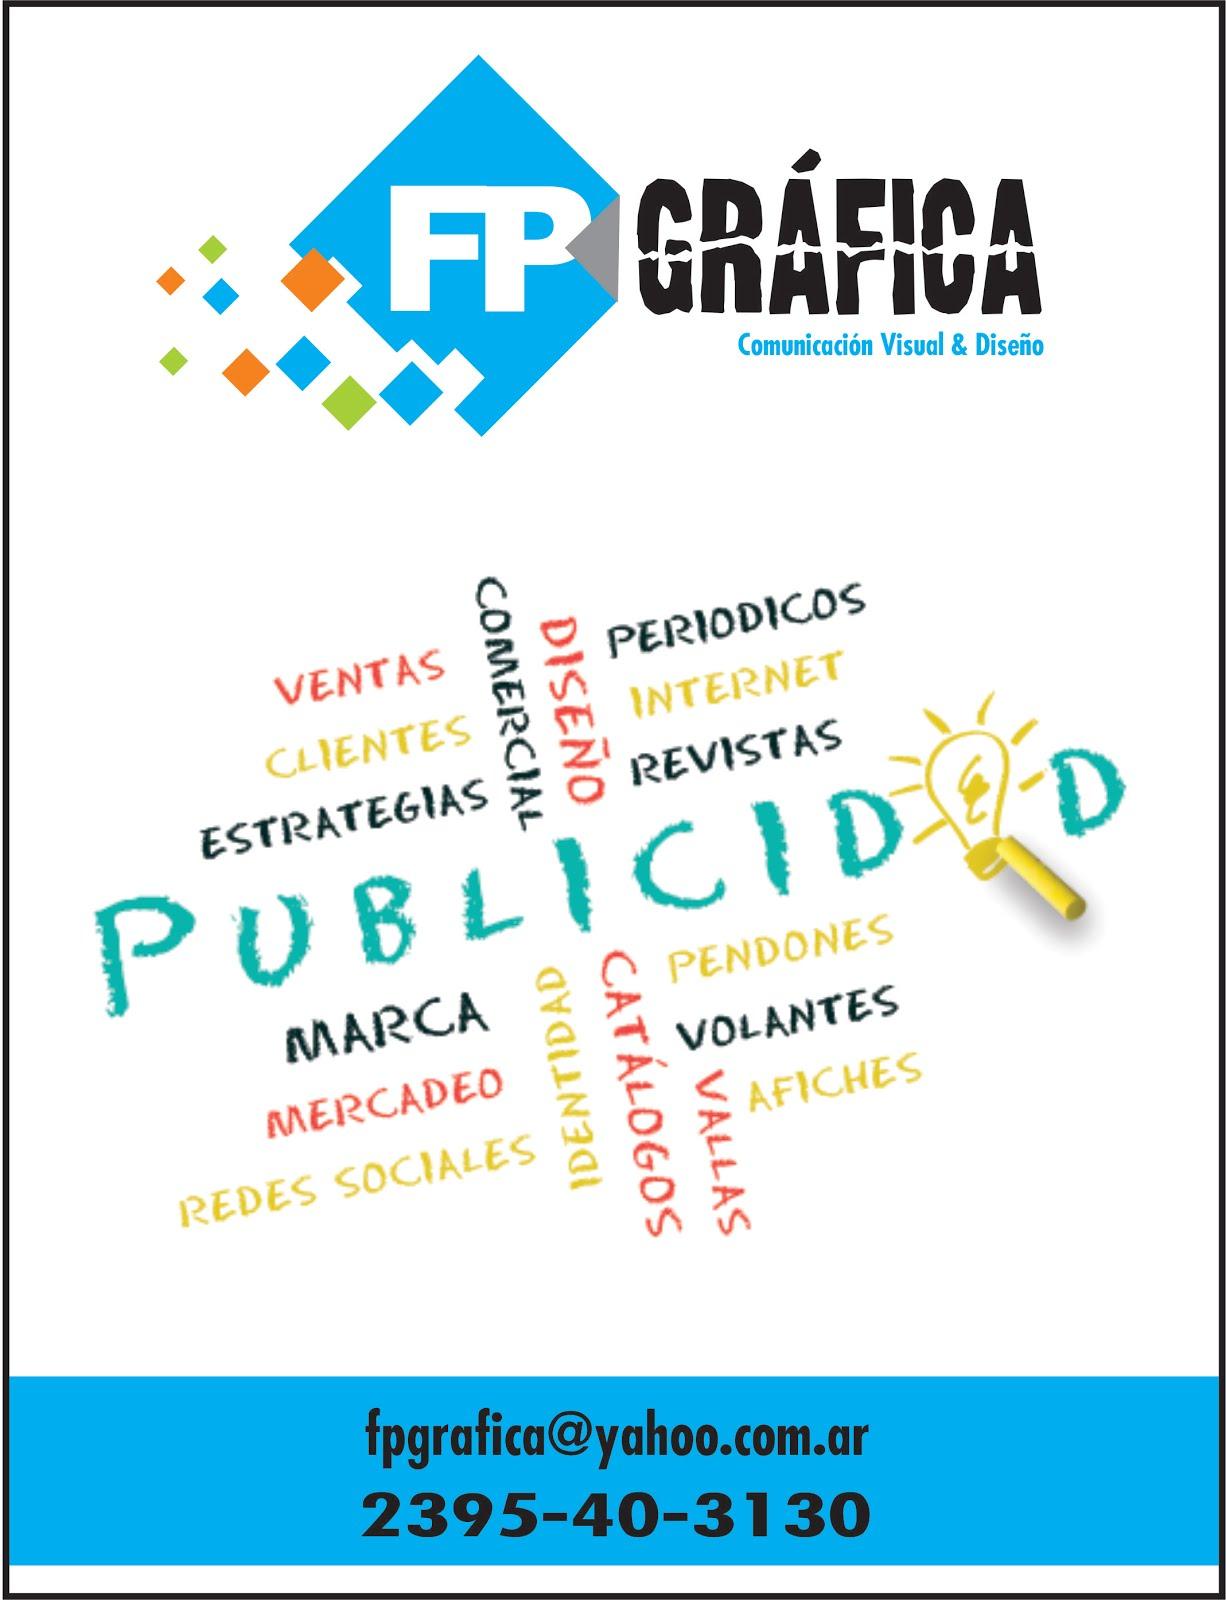 FP Grafica